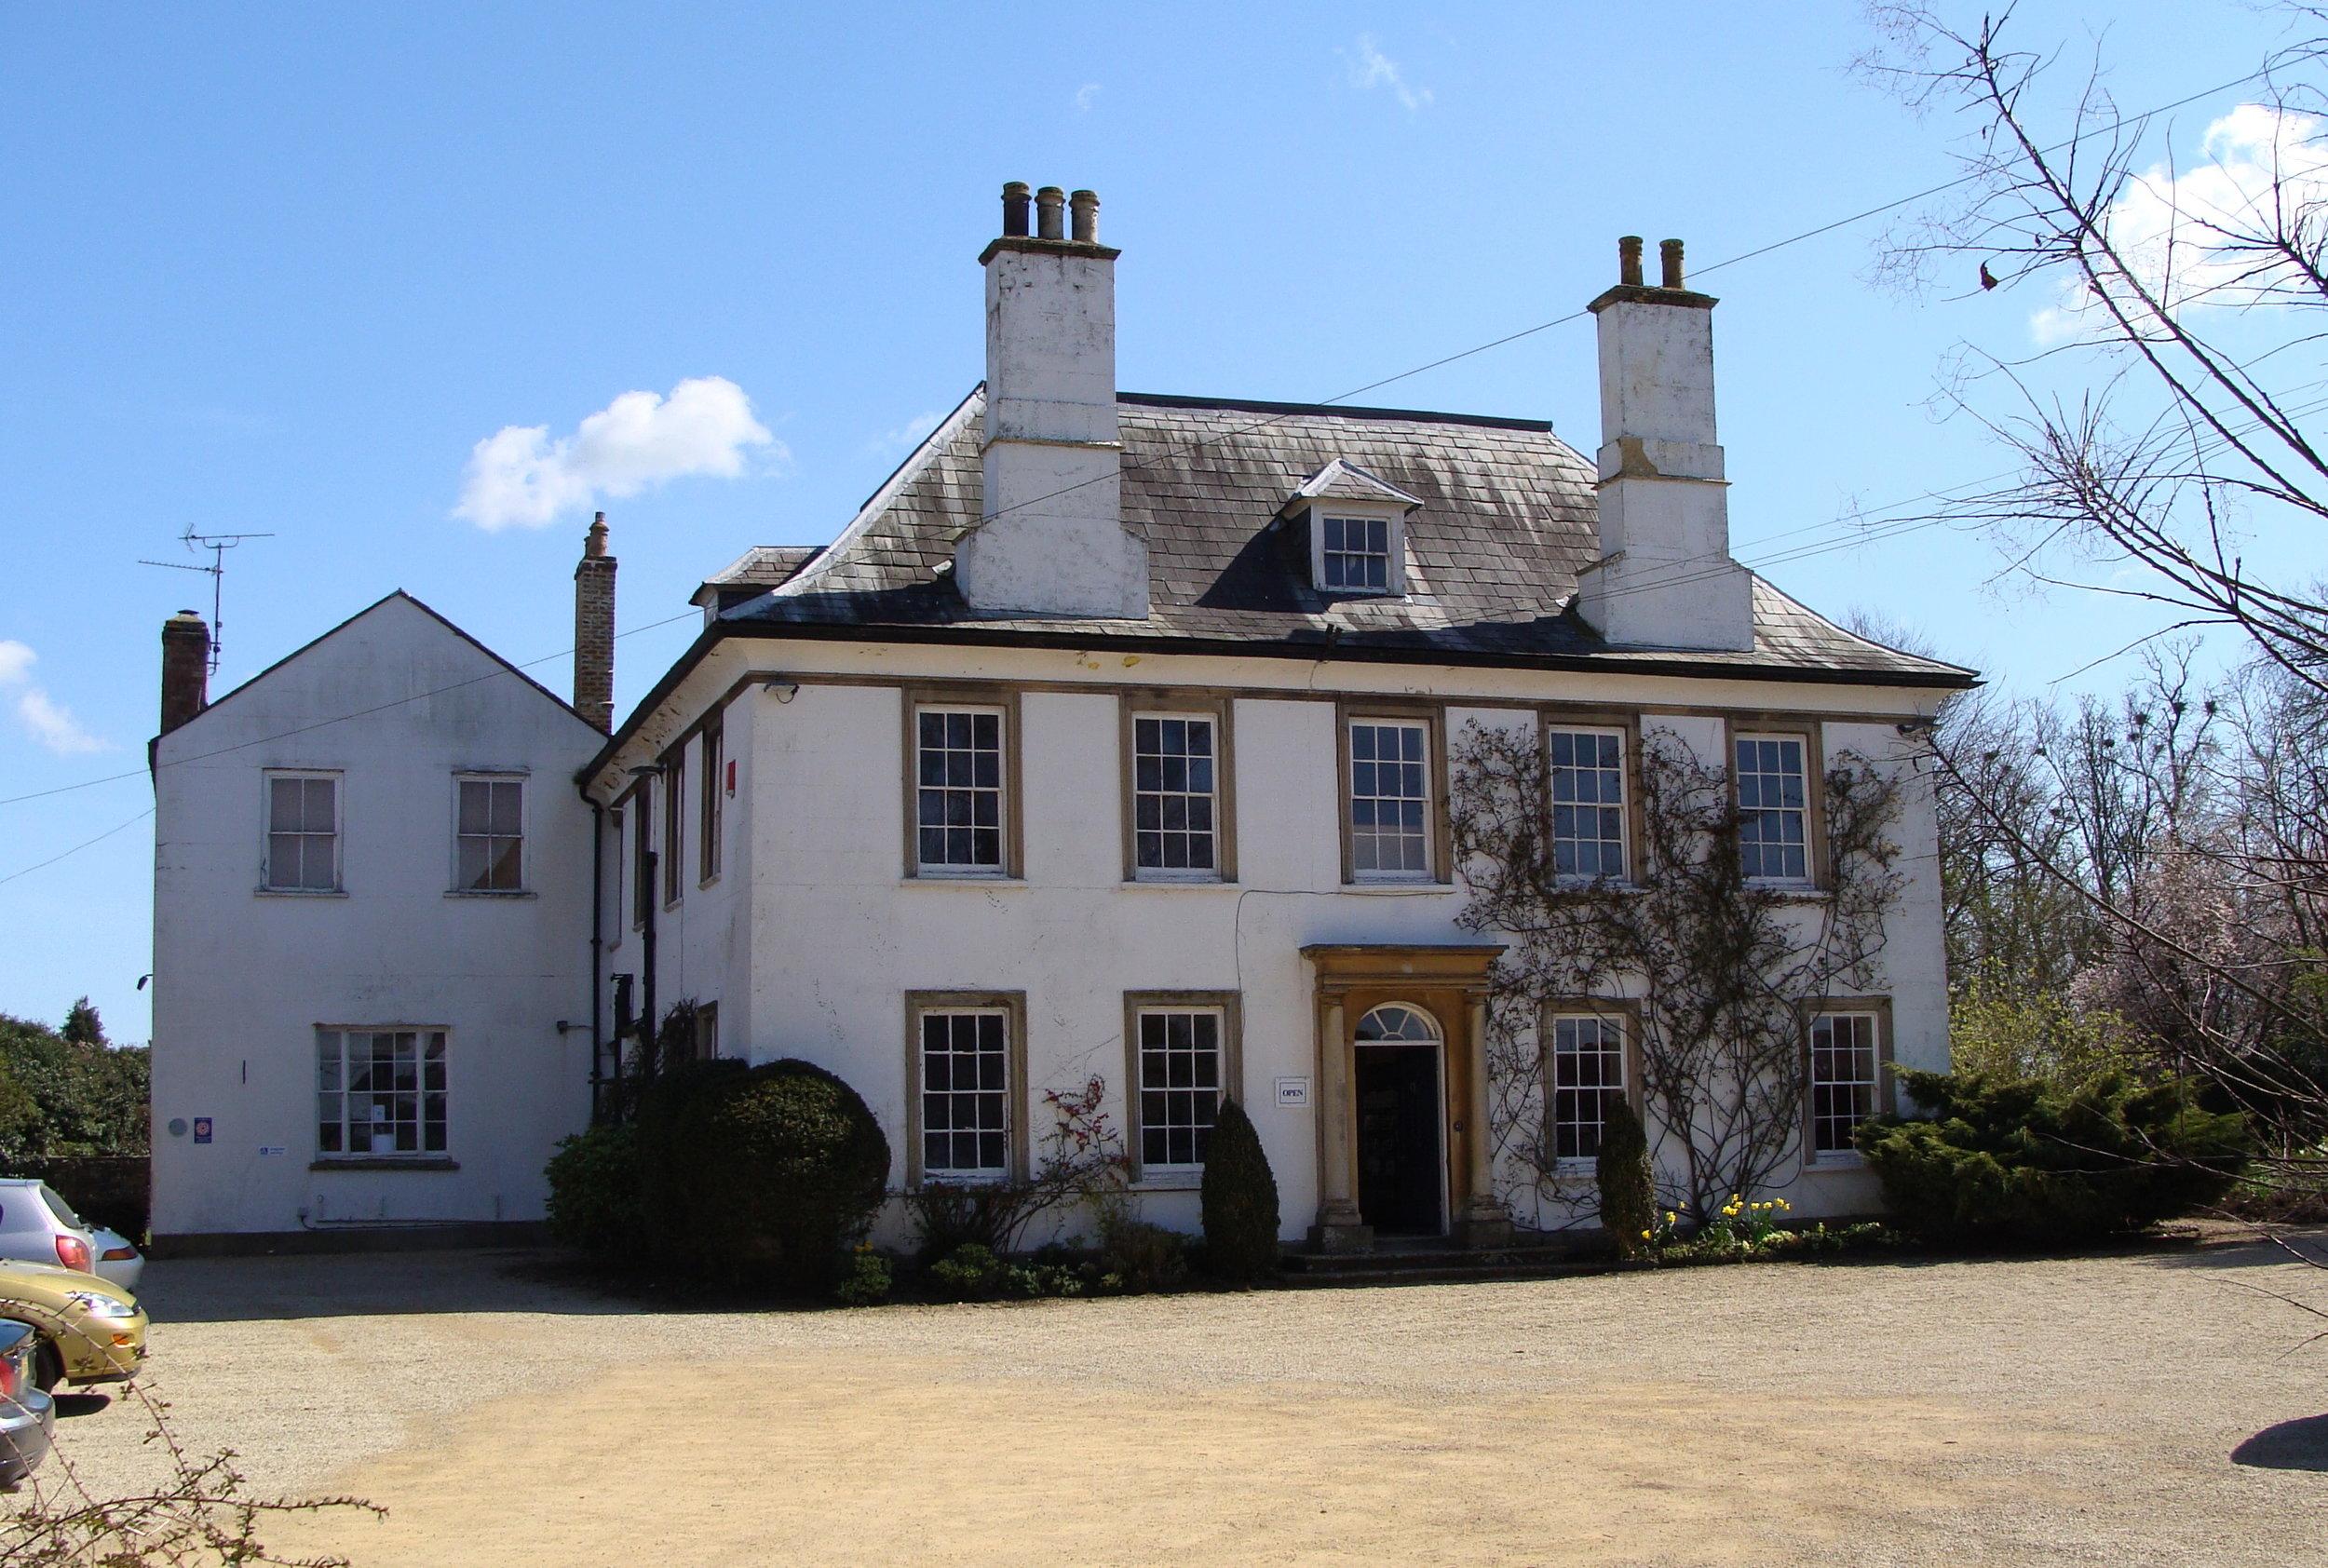 Edward Jenners House